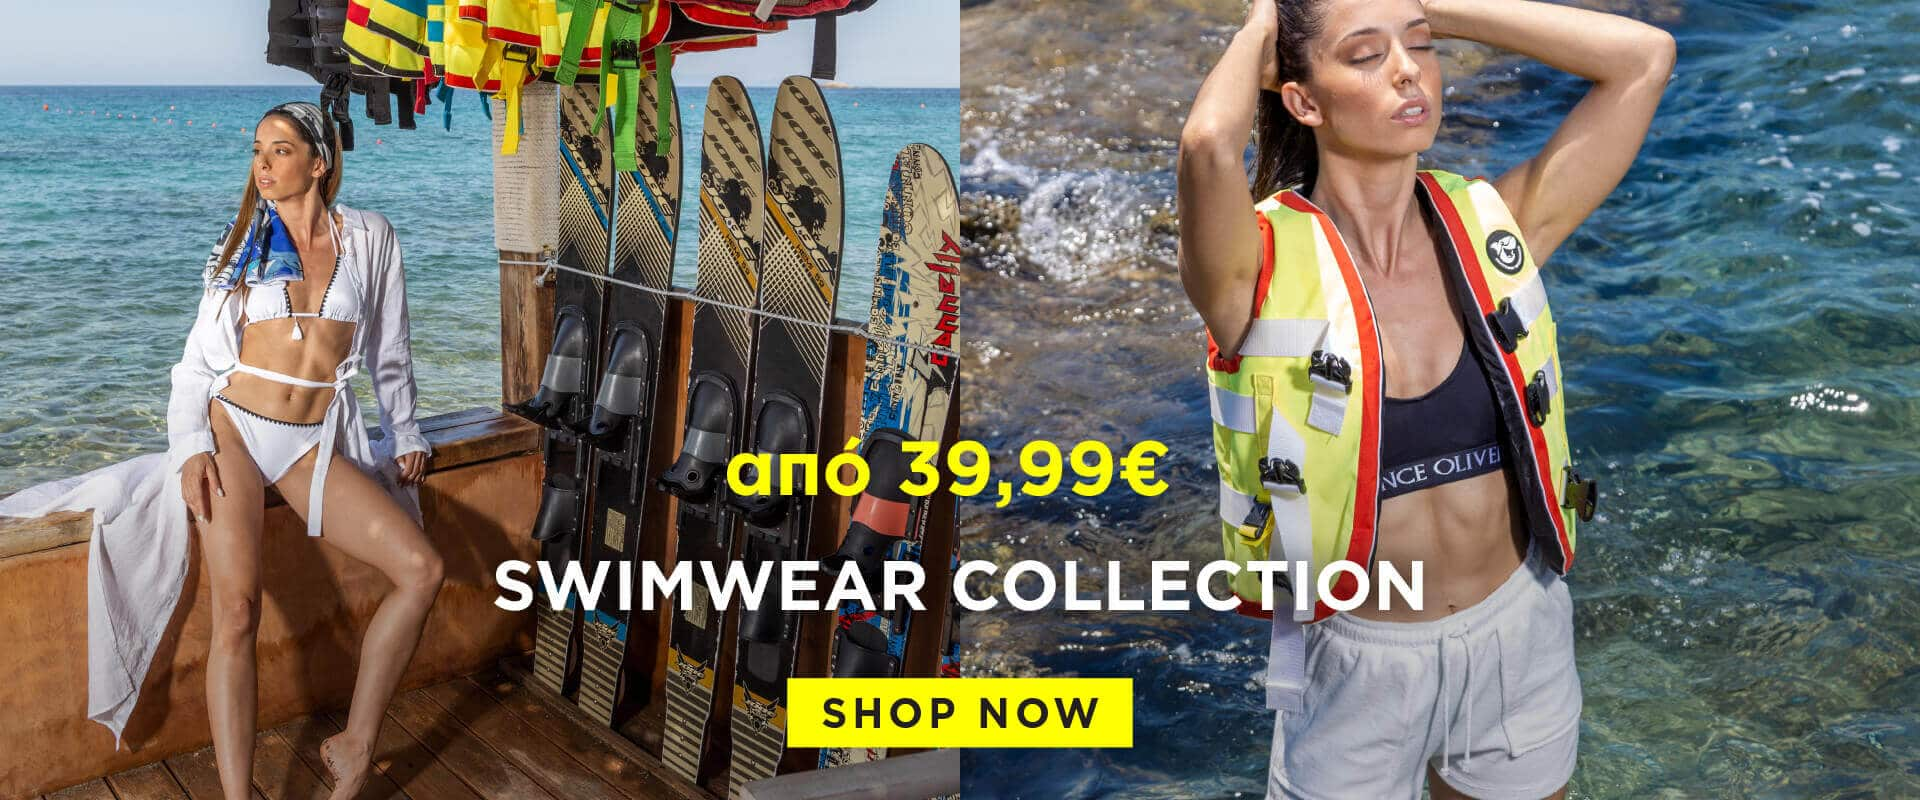 banner_woman_swimwear